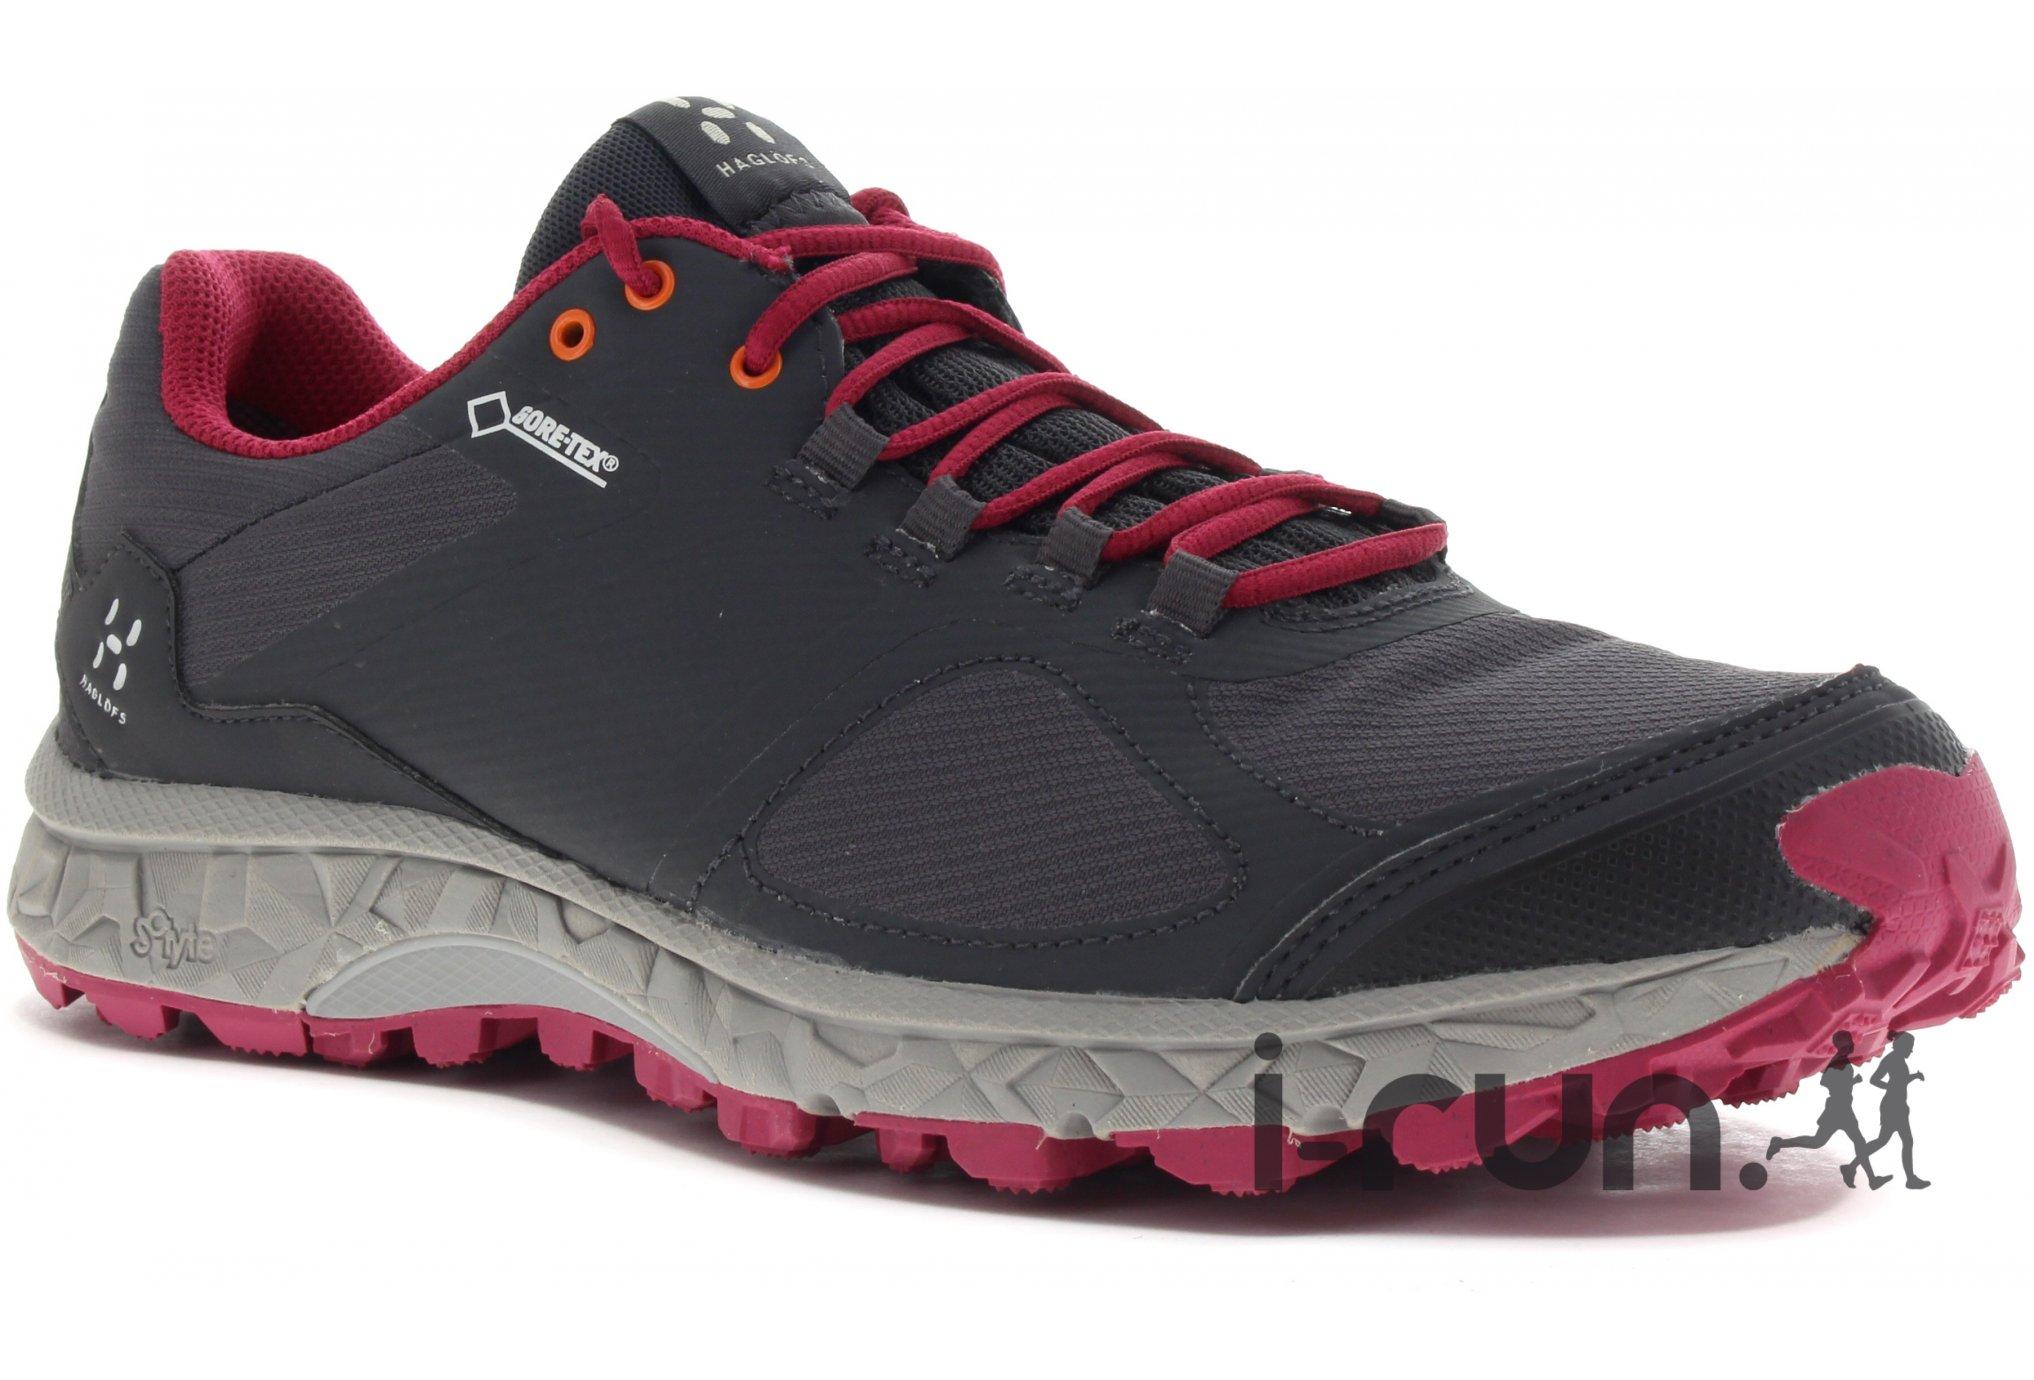 Haglöfs Gram AM II Gore-Tex W Chaussures running femme